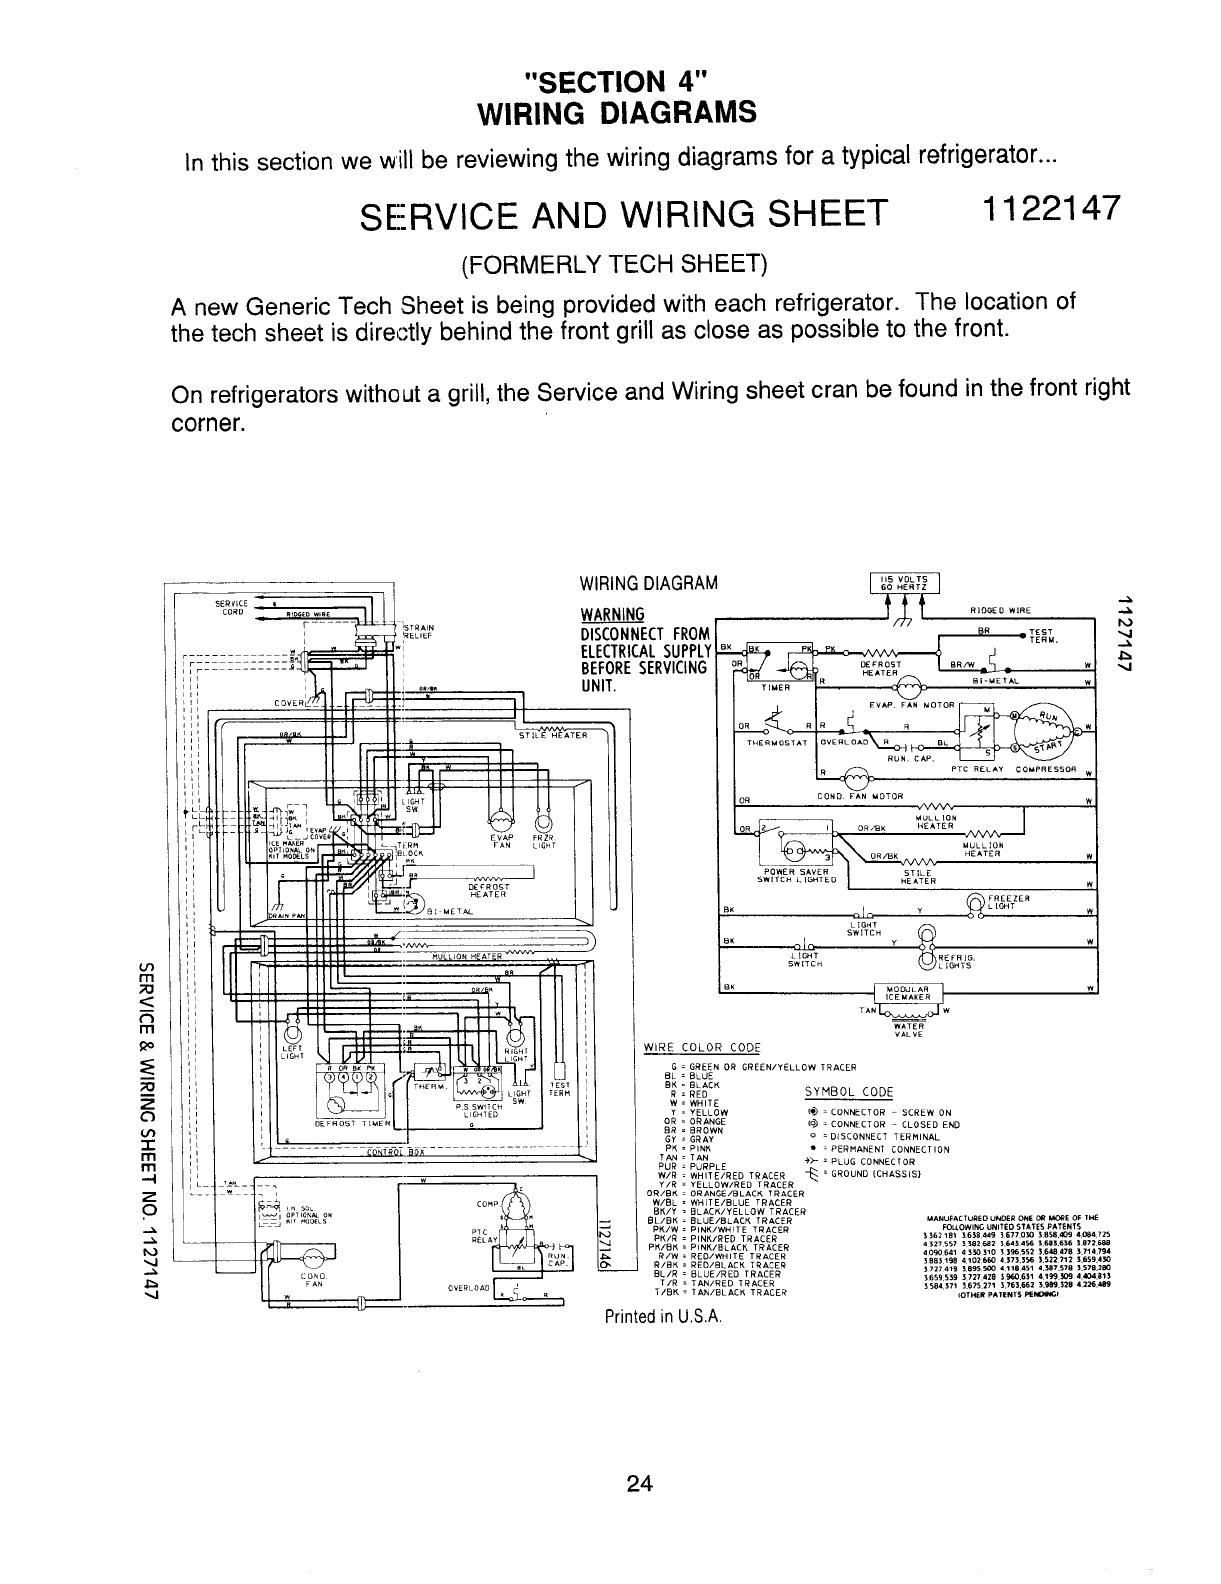 4314066b Whrlpl Basic Refrigeration Diagnosis R 65 Ptc Relay Refrigerator Wiring Diagram Sur